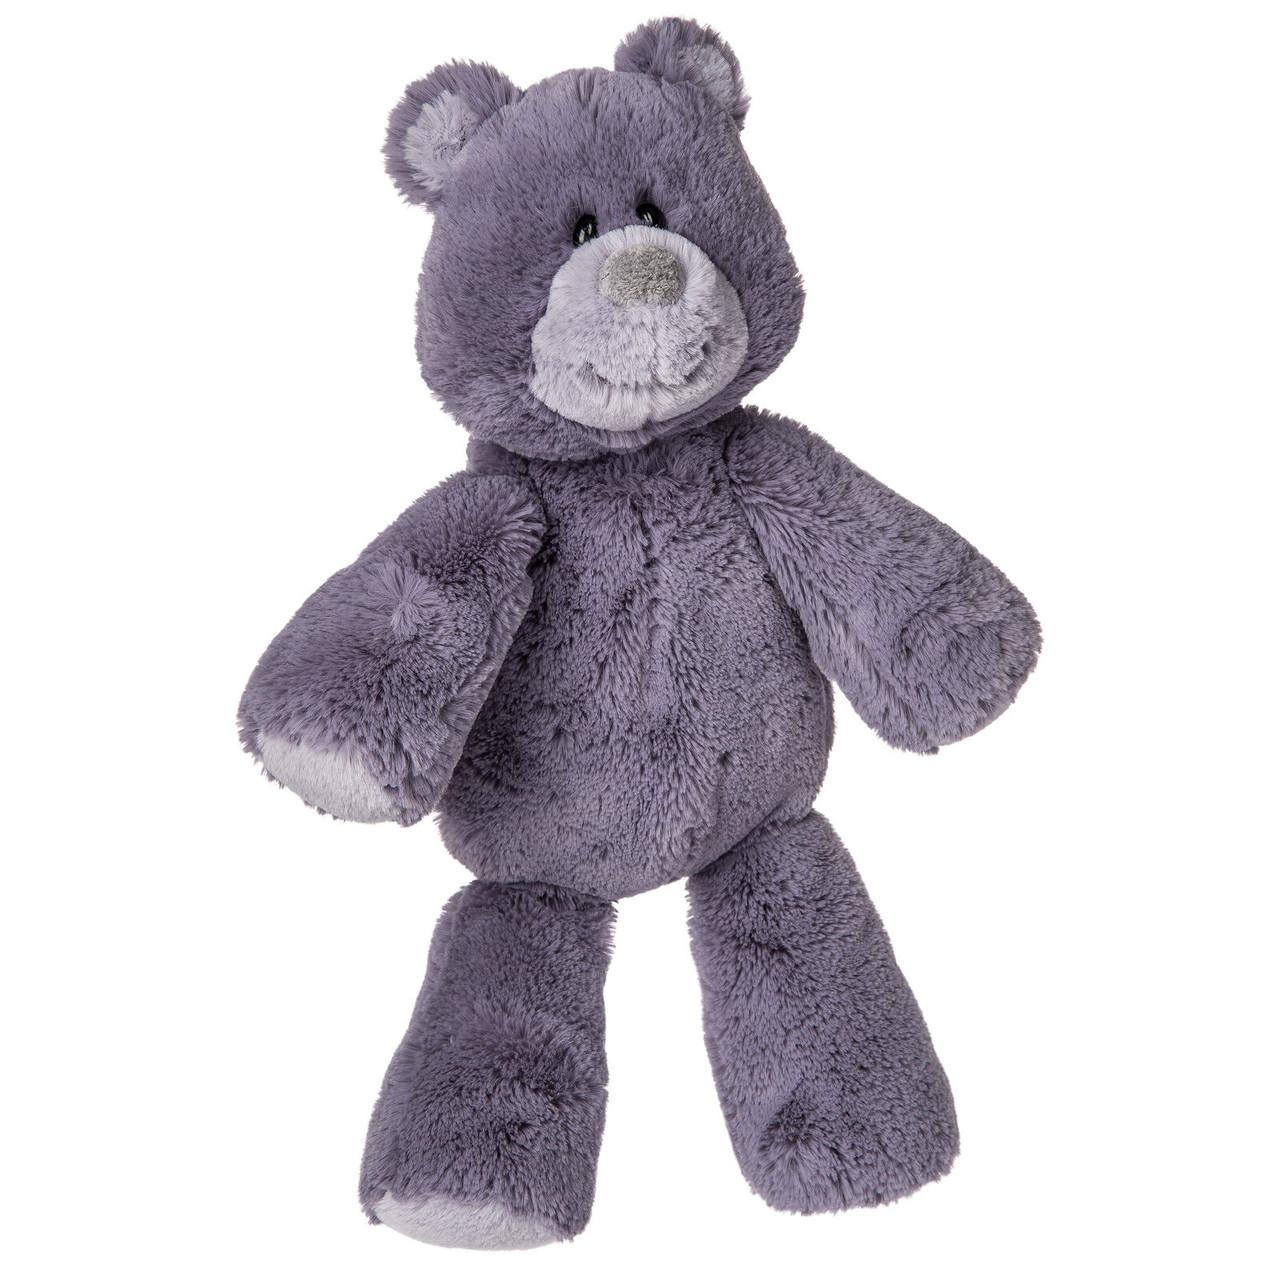 MARSHMALLOW BERRY BEAR